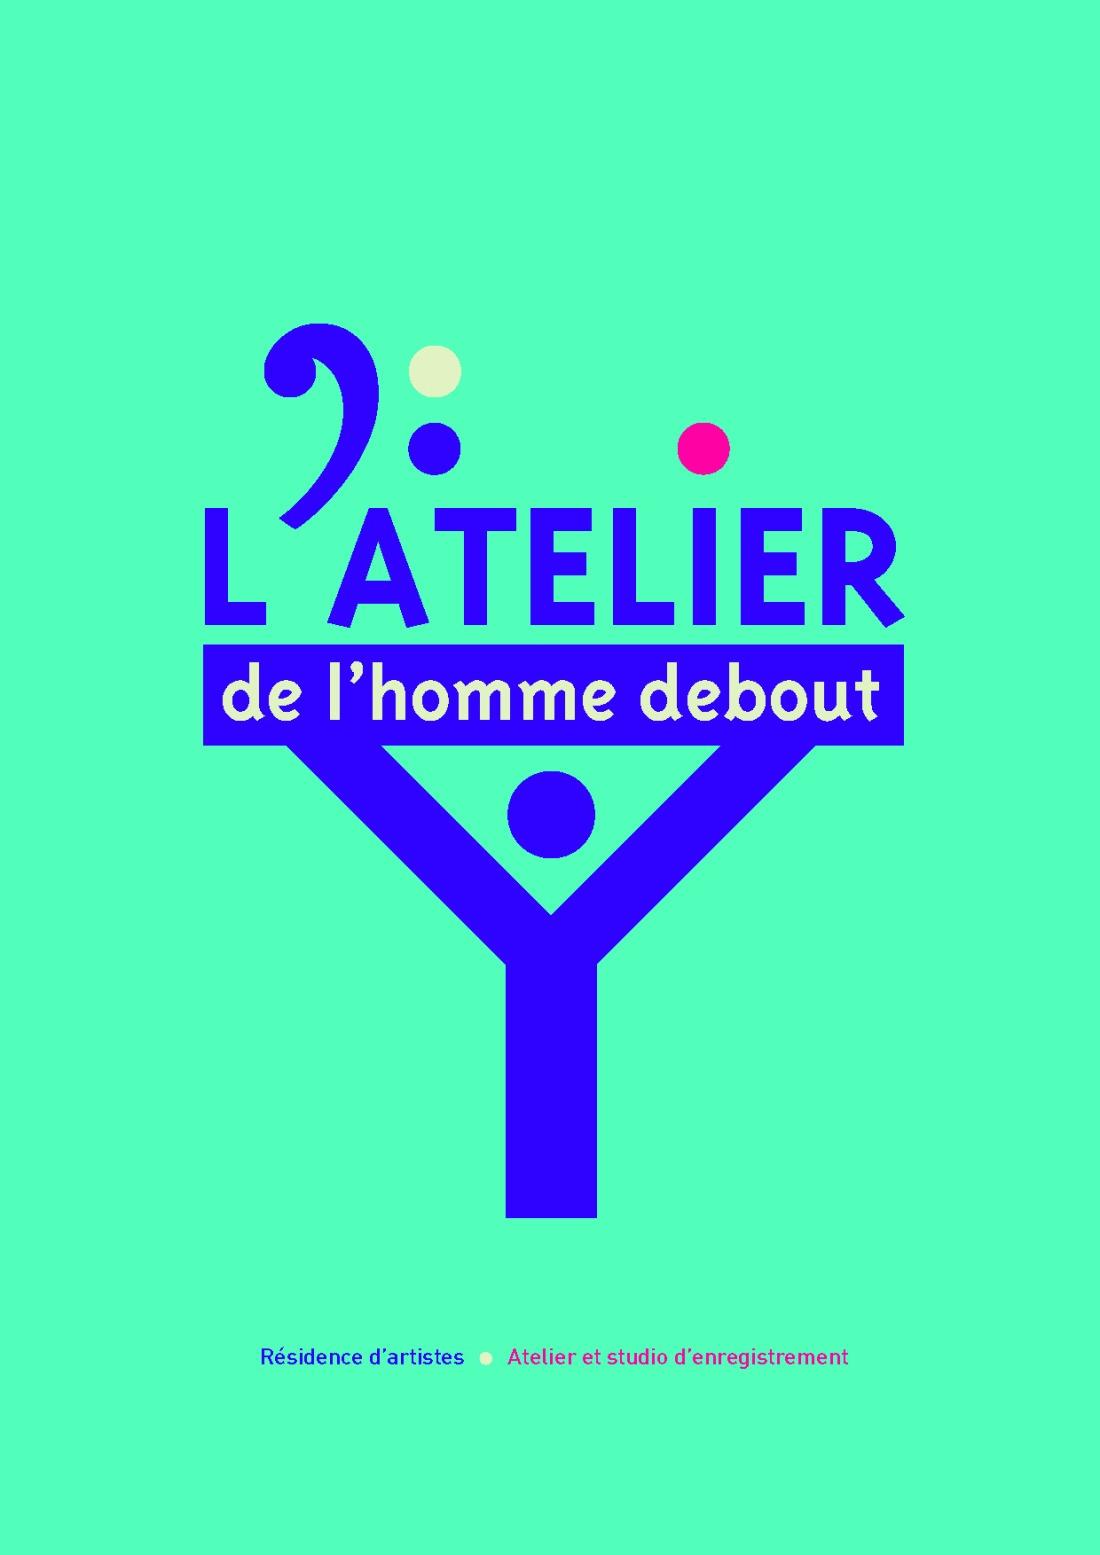 logo_atelier_homme_debout